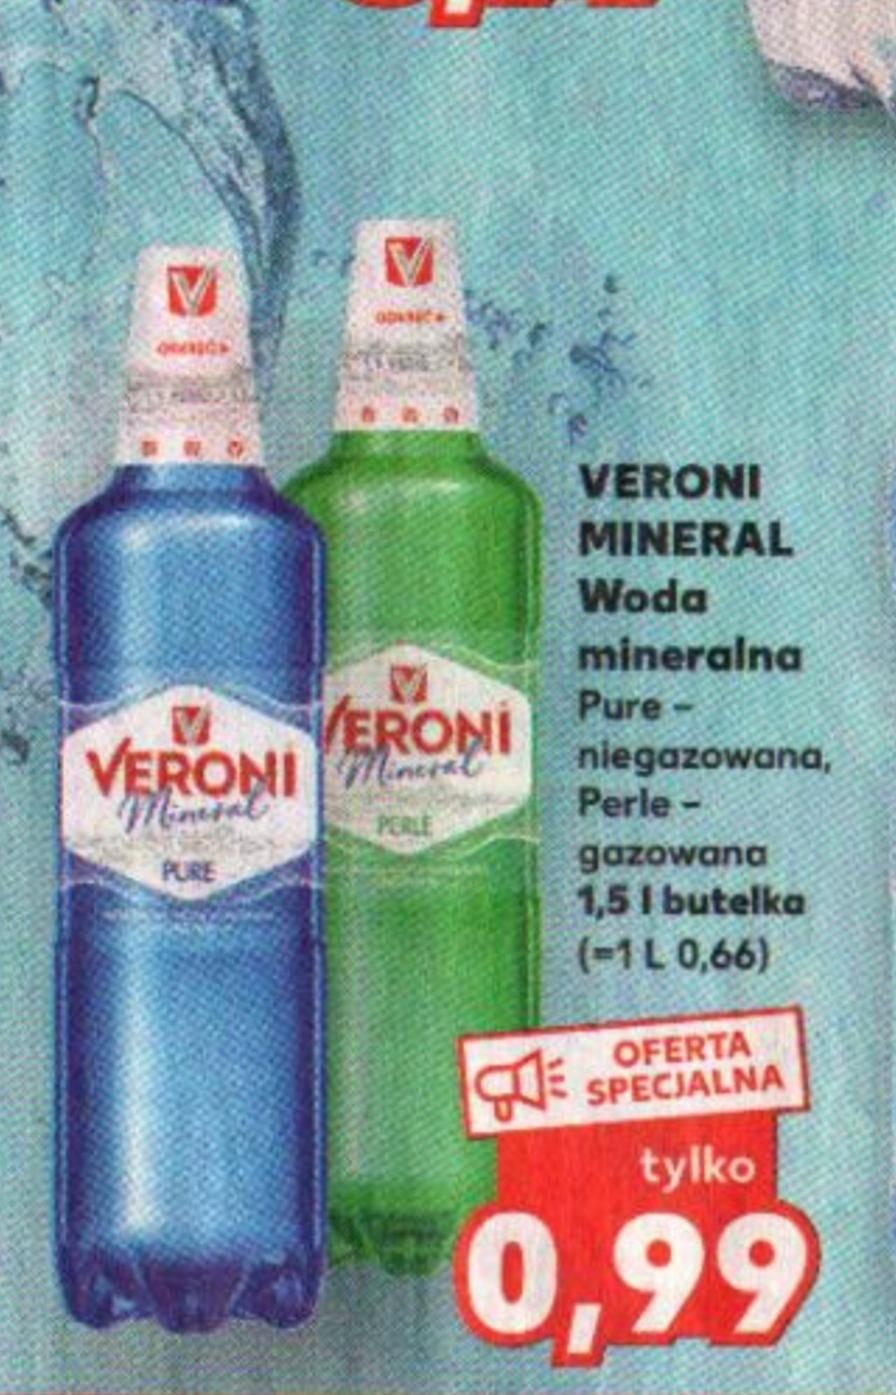 Woda mineralna Veroni 1.5 L@ Kaufland 29.10-04.11.2020